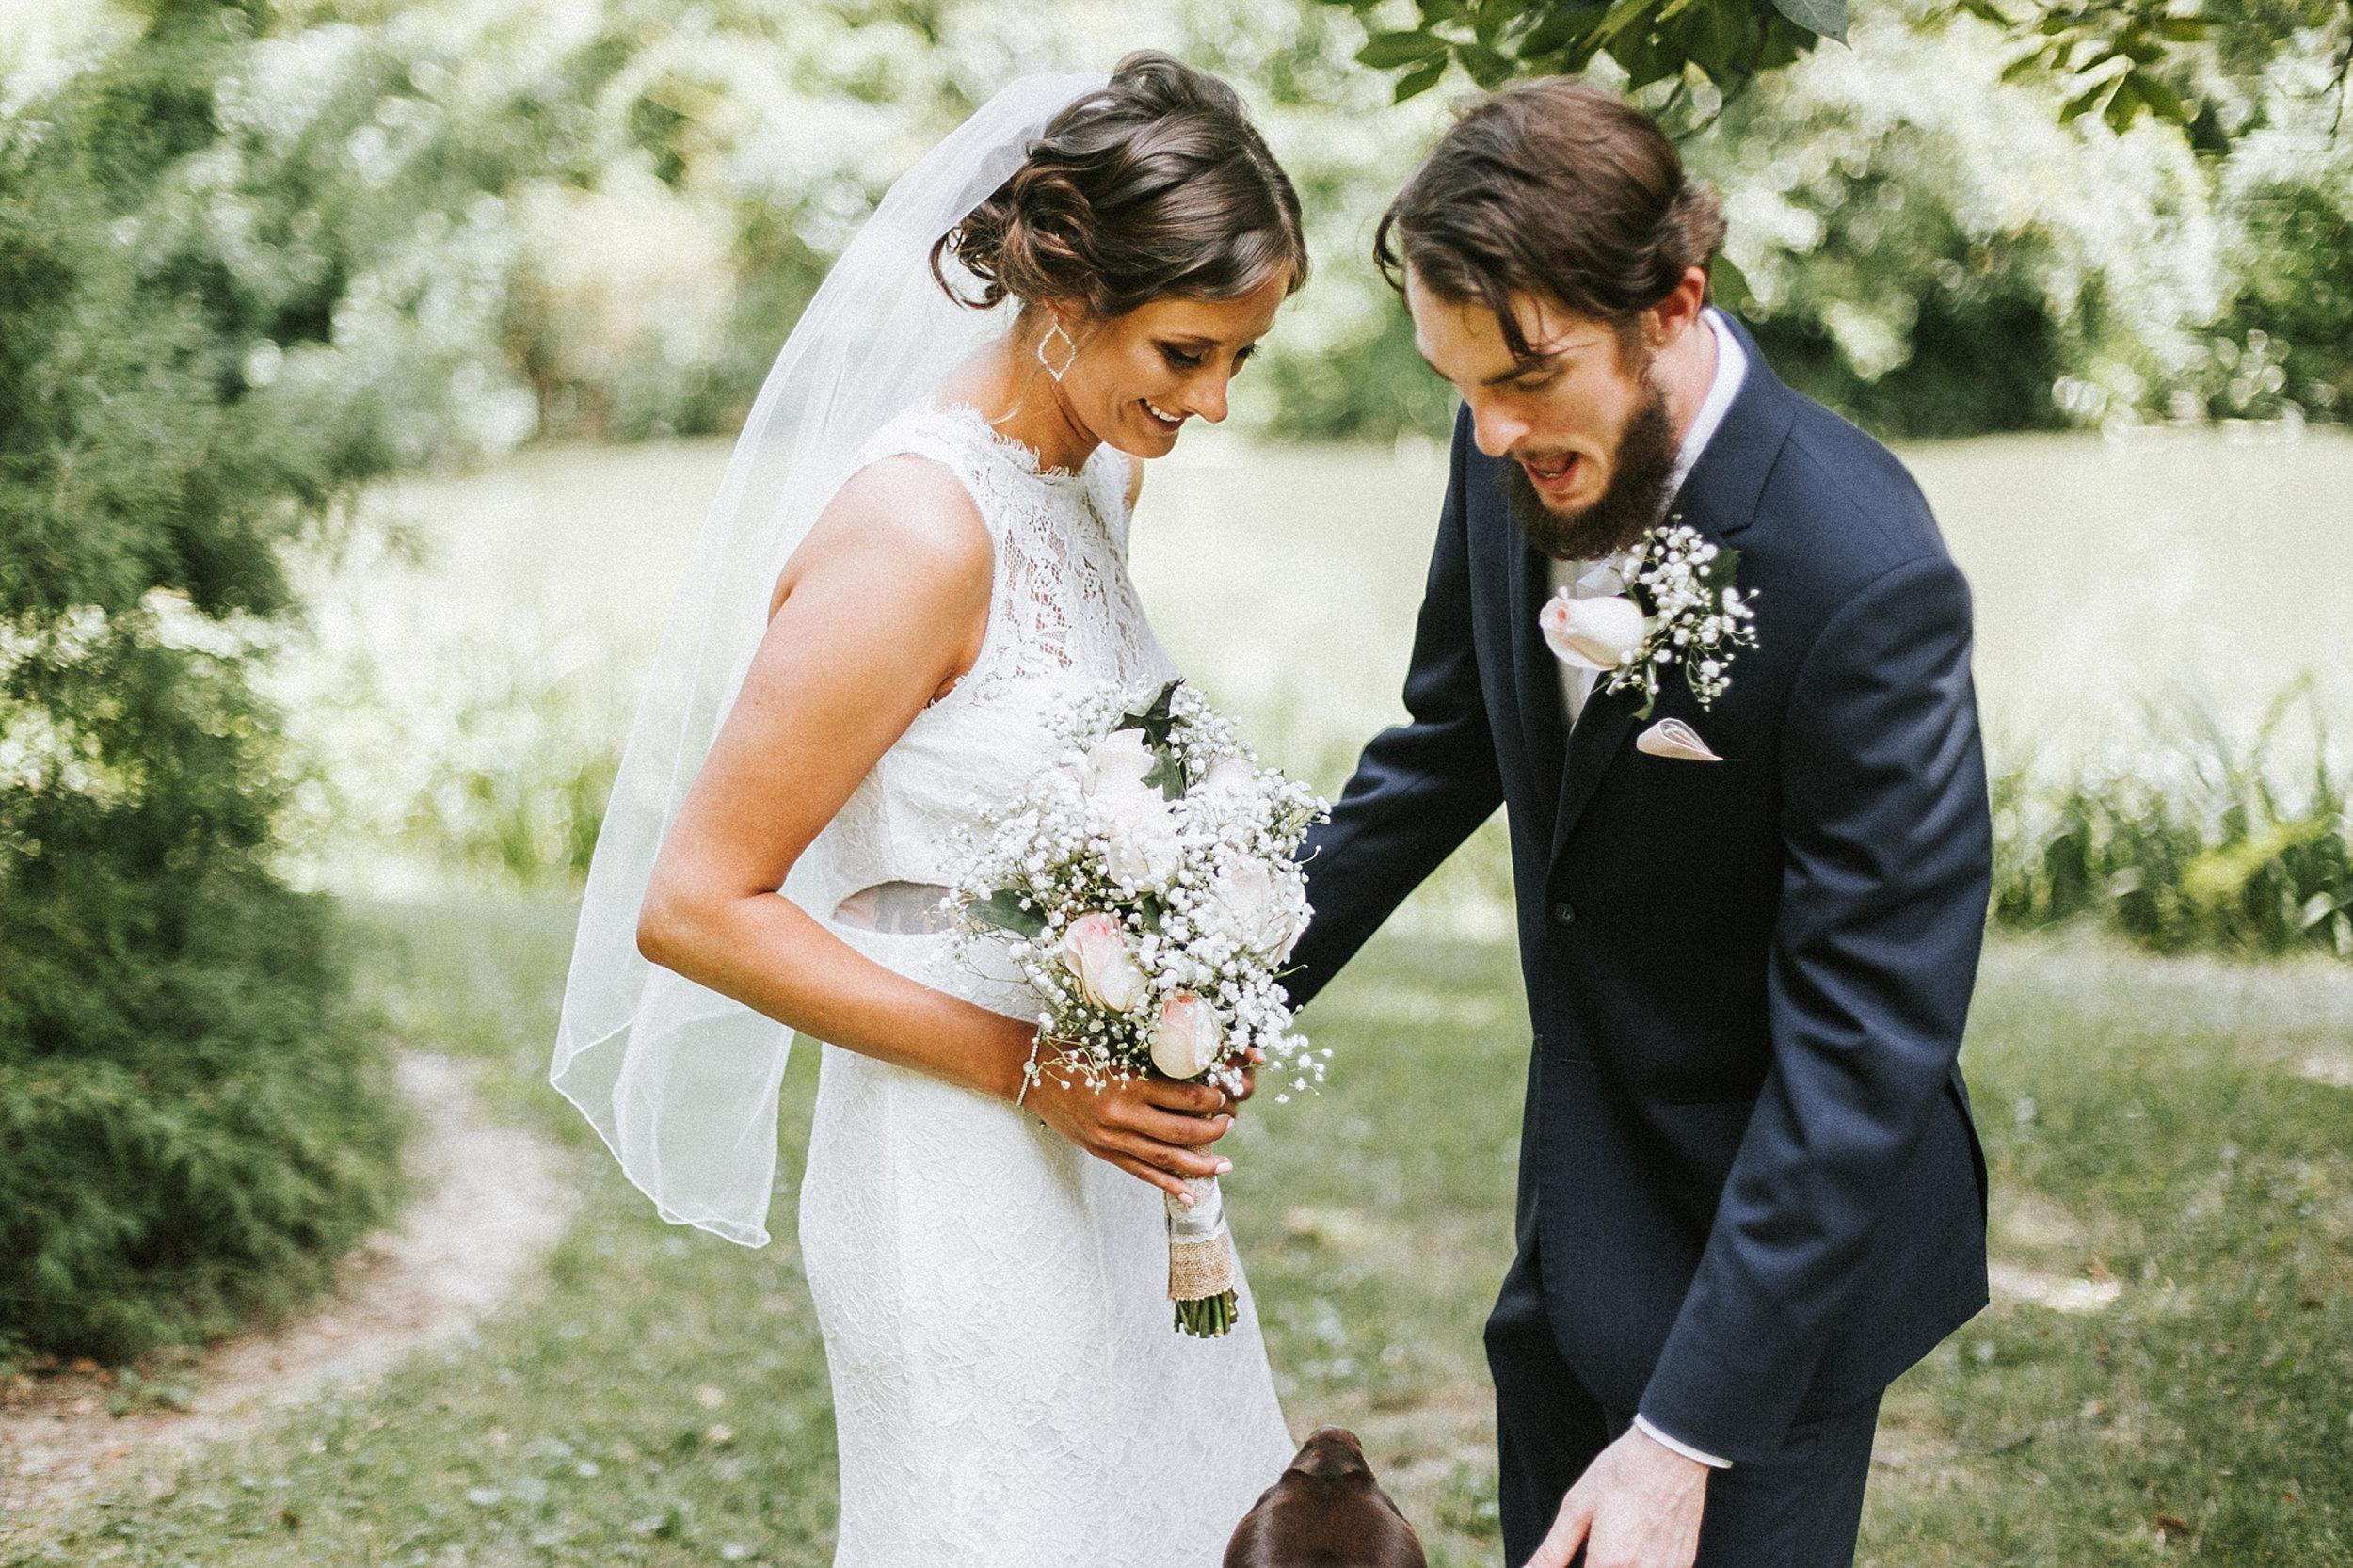 Brooke Townsend Photography - Ohio Wedding Photographer (14 of 78).jpg